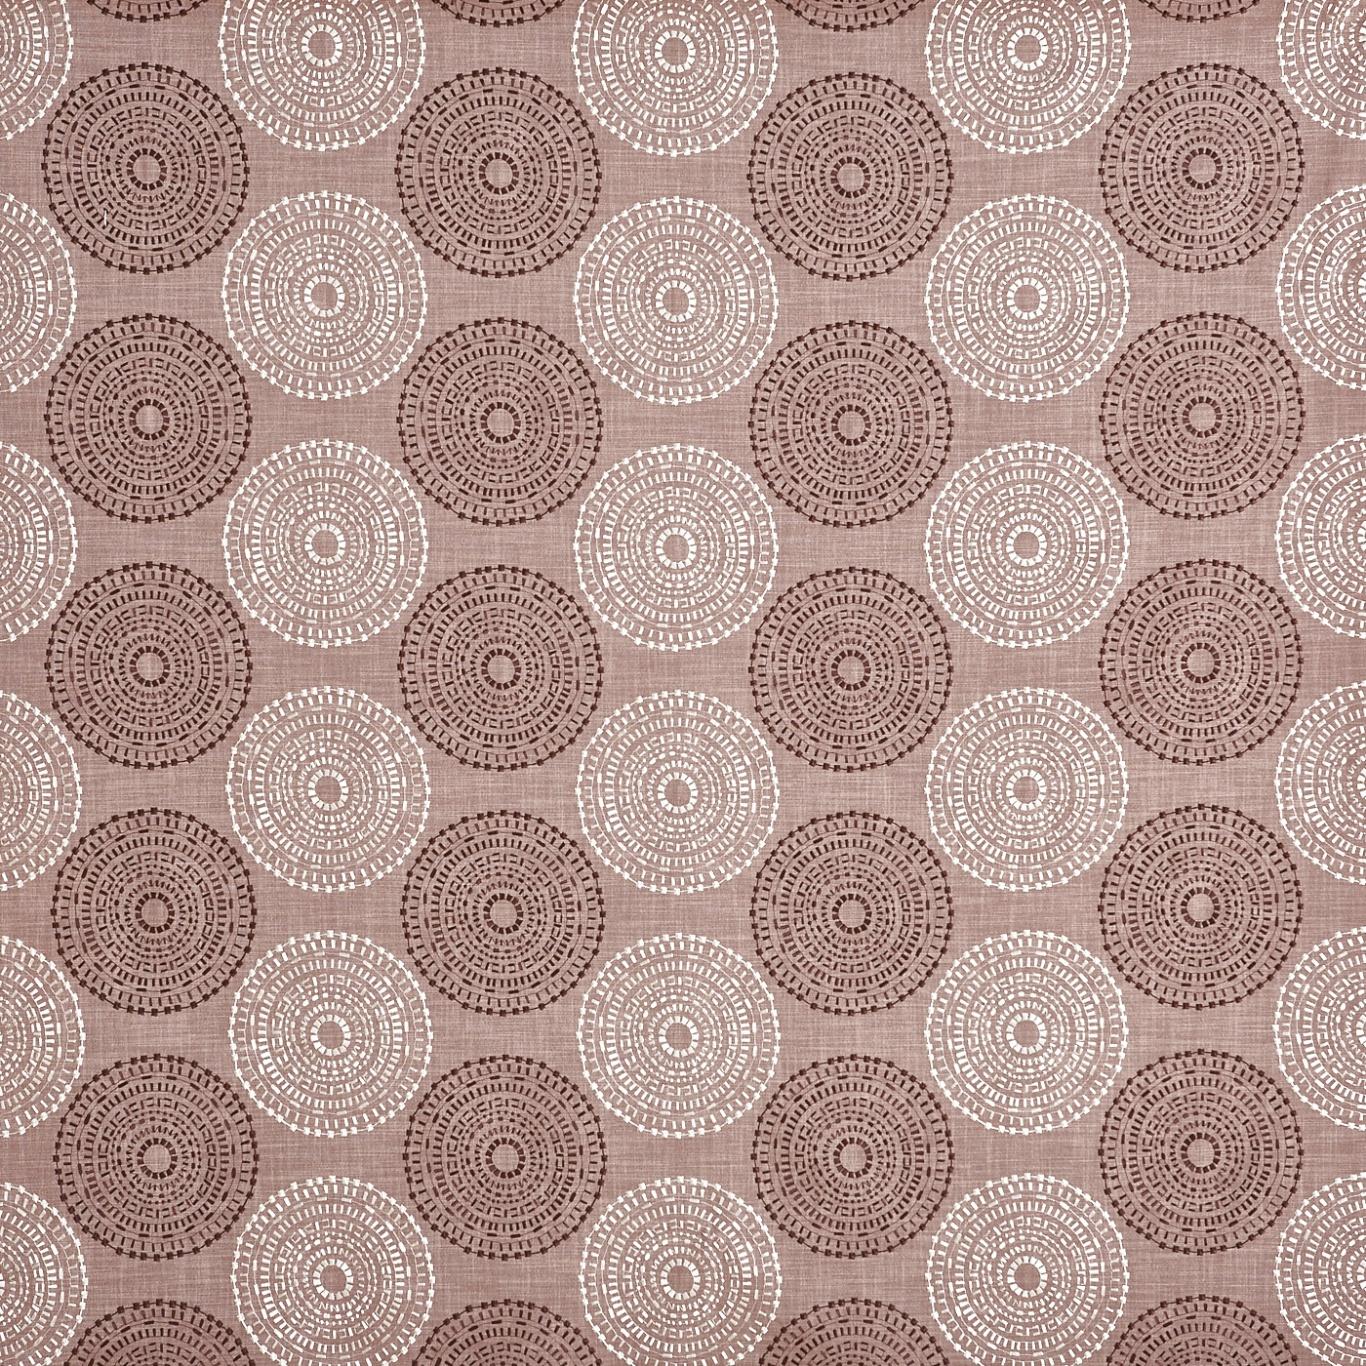 Image of Prestigious Hemisphere Rose Fabric 3796/204